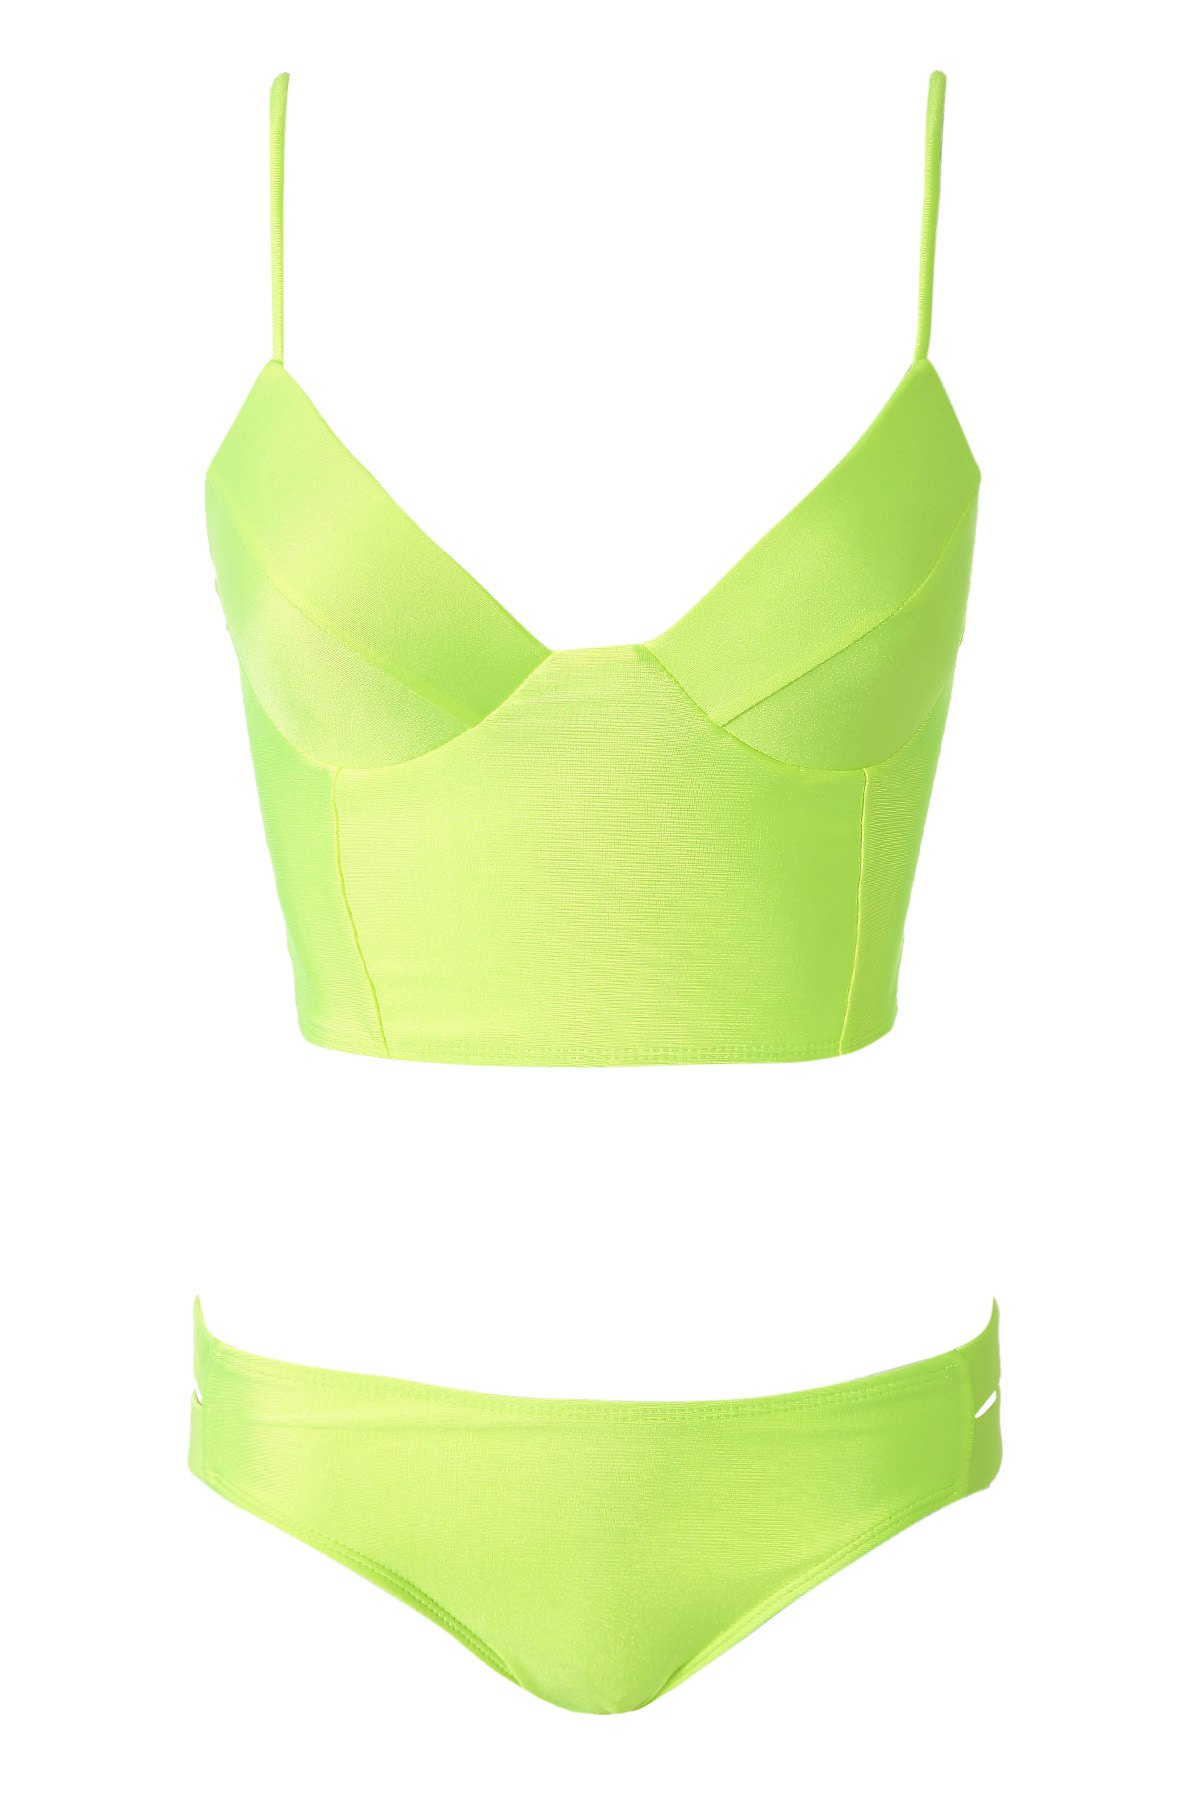 Womens bikini lime green color solid